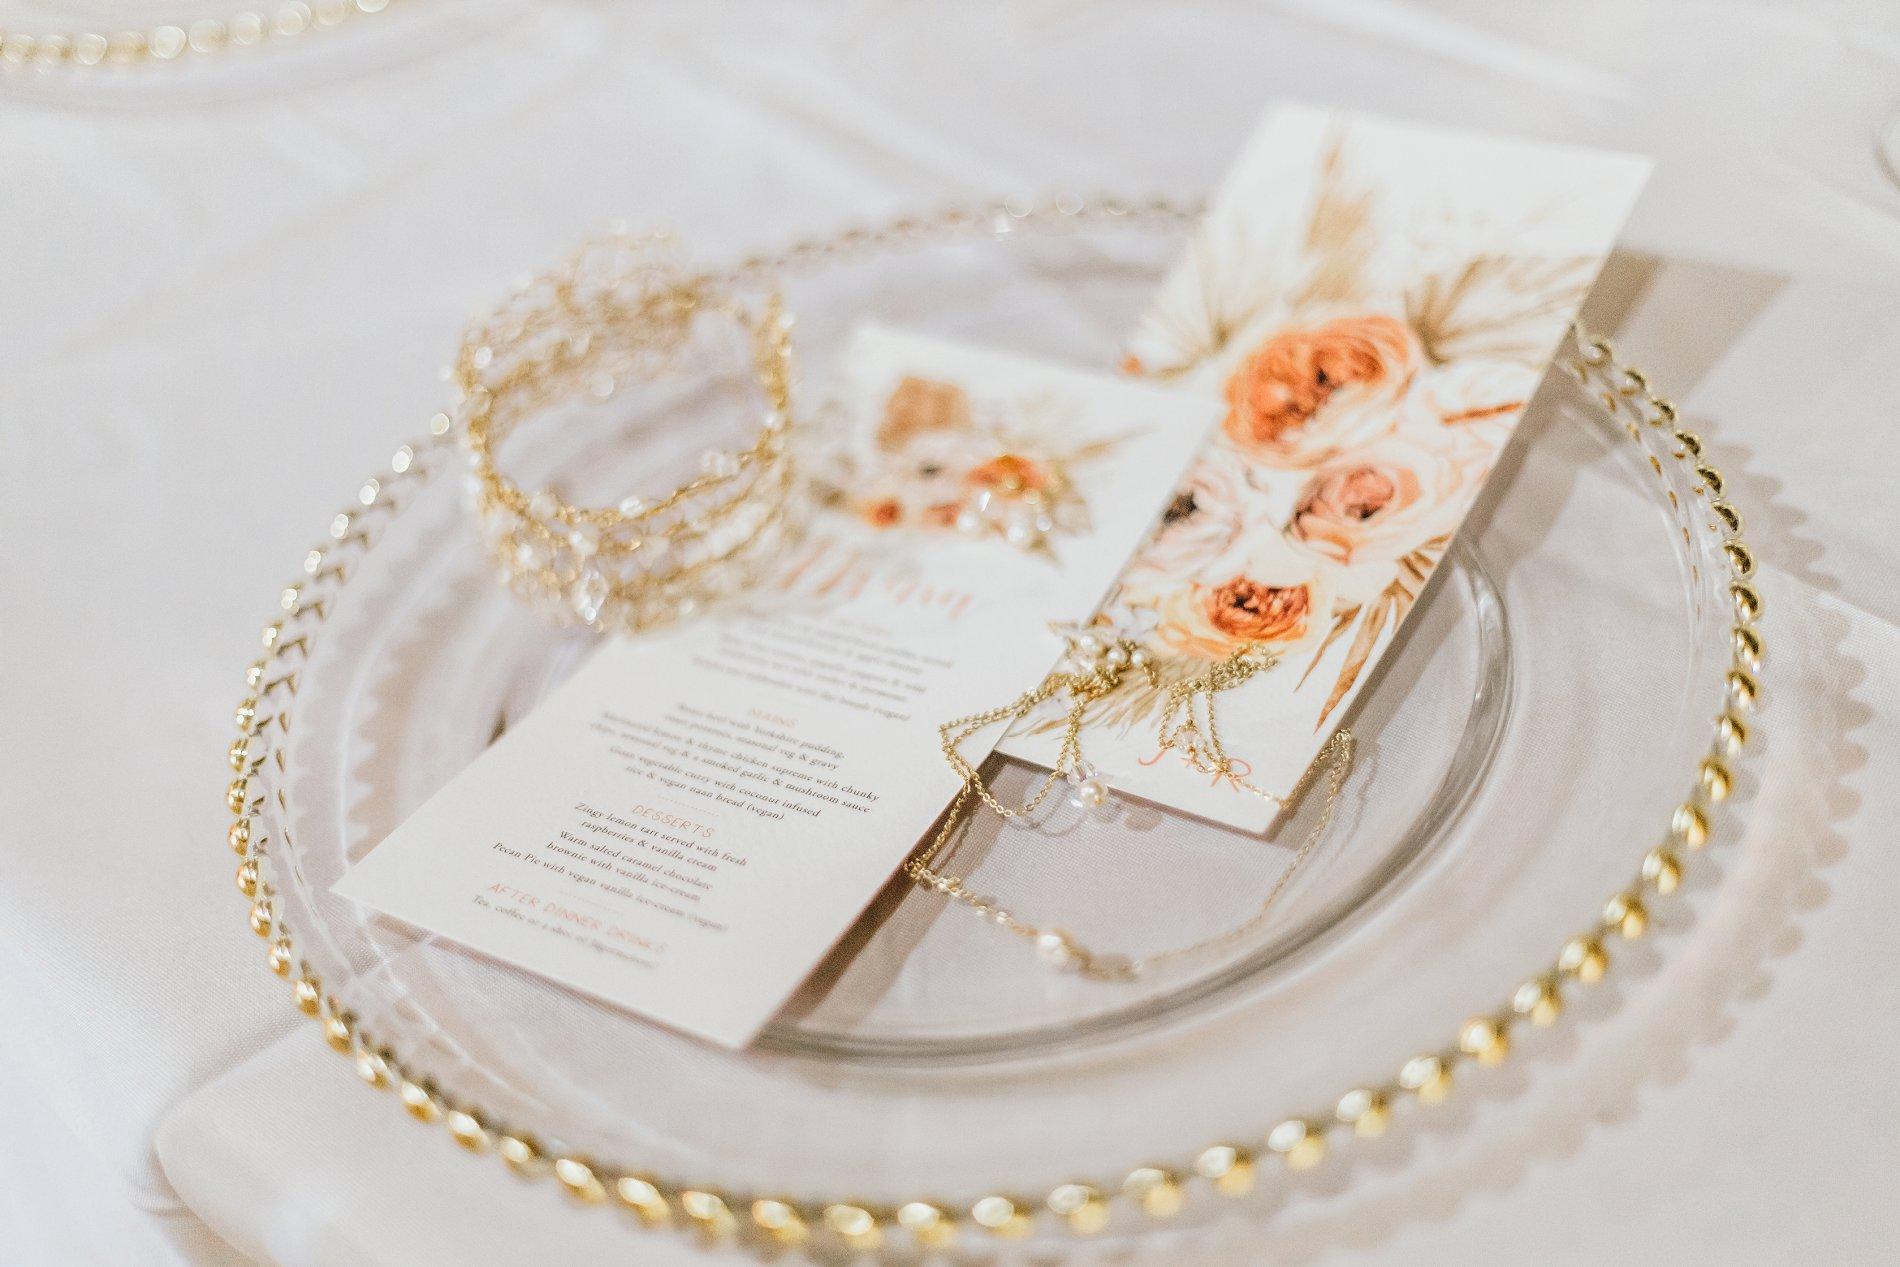 A Golden Boho Wedding Shoot at Cressing Temple Barns (c) Kate Boston Photography (2)